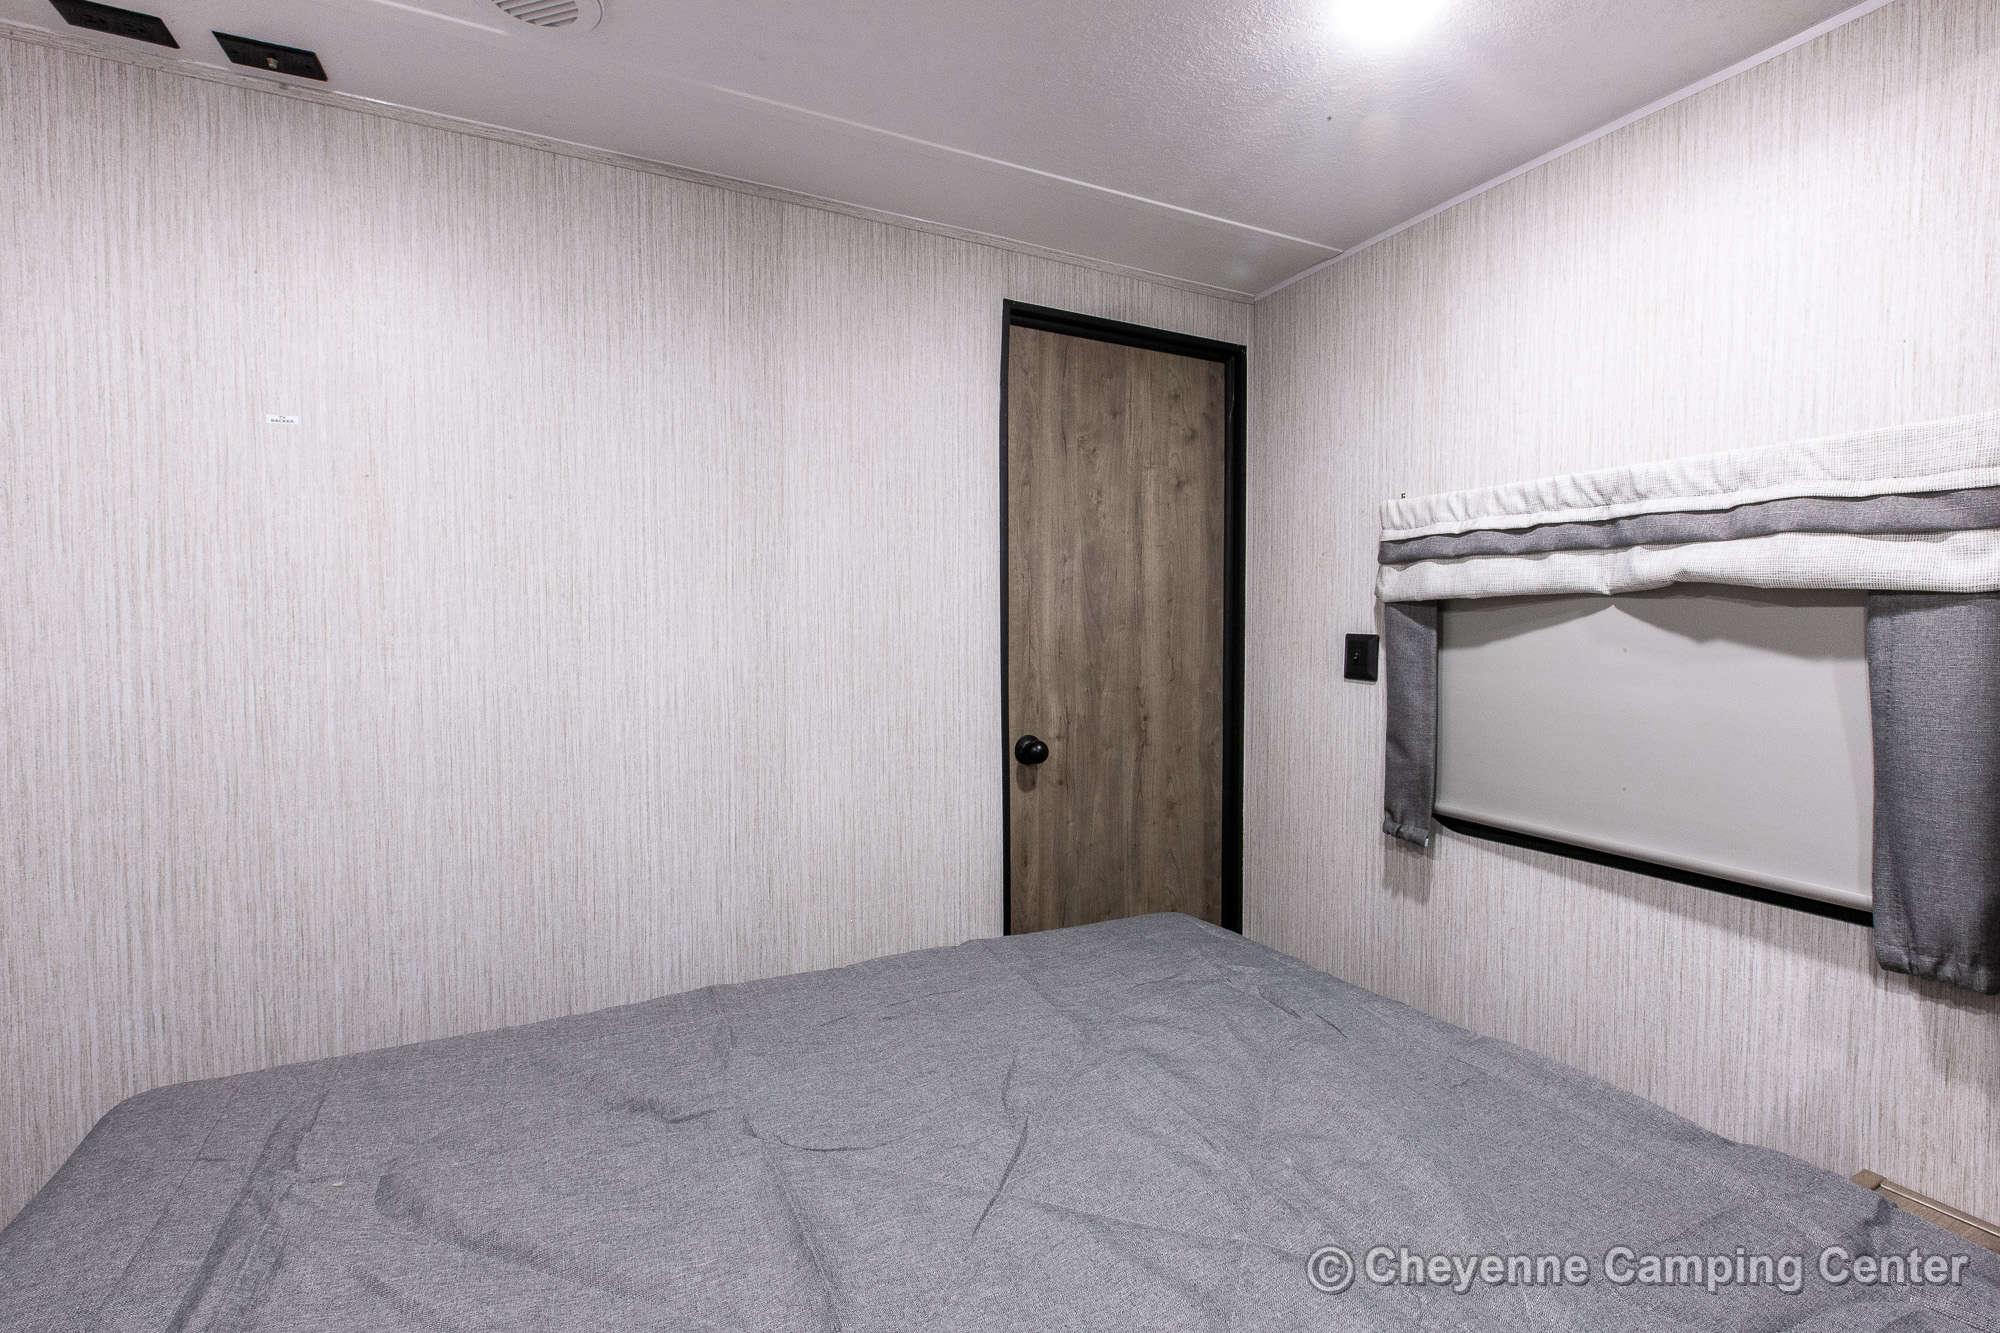 2022 Palomino Puma 25RKQB Travel Trailer Interior Image